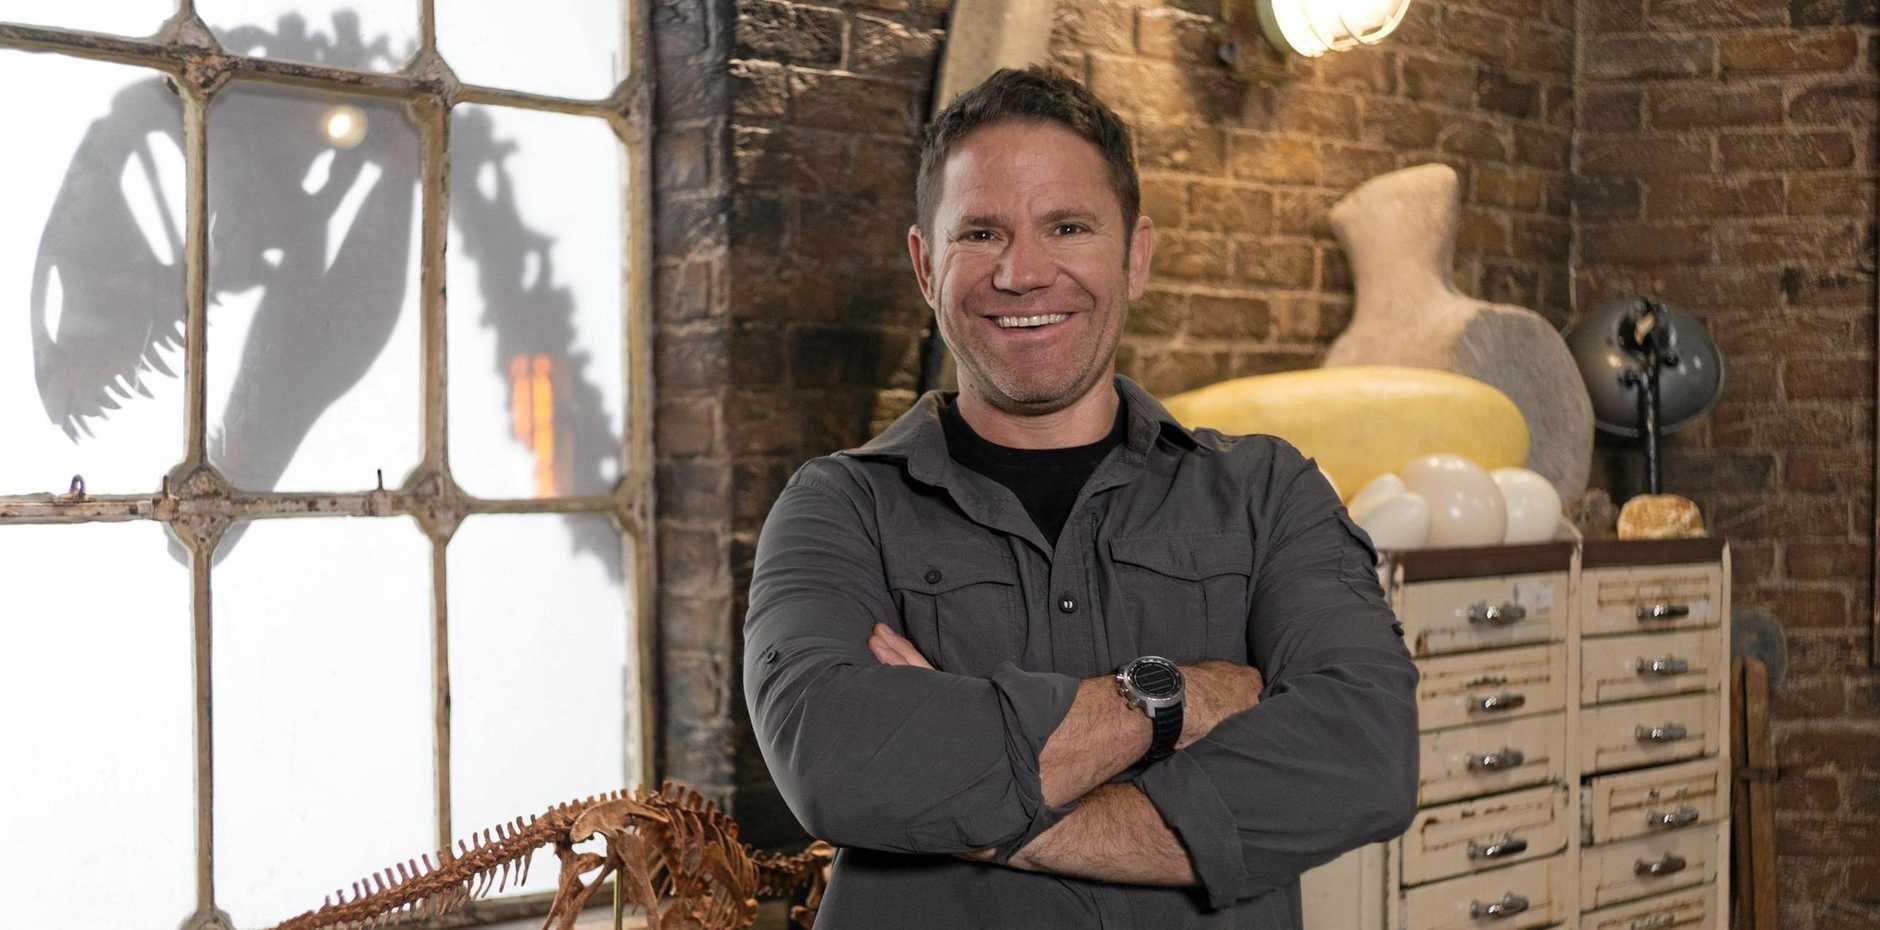 DINOSAURS REBORN: Steve Backshall stars in the movie  Deadly Dinosaurs .